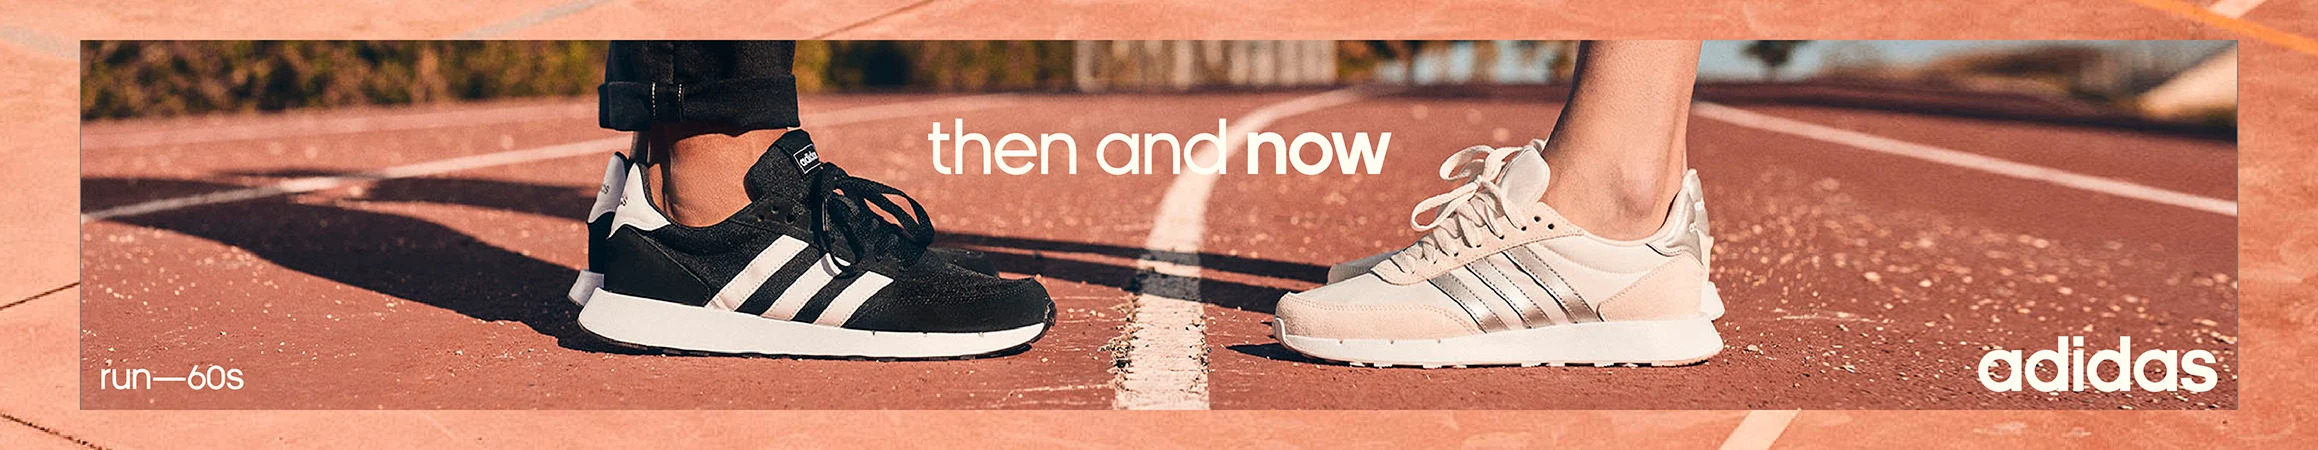 adidas run 60's